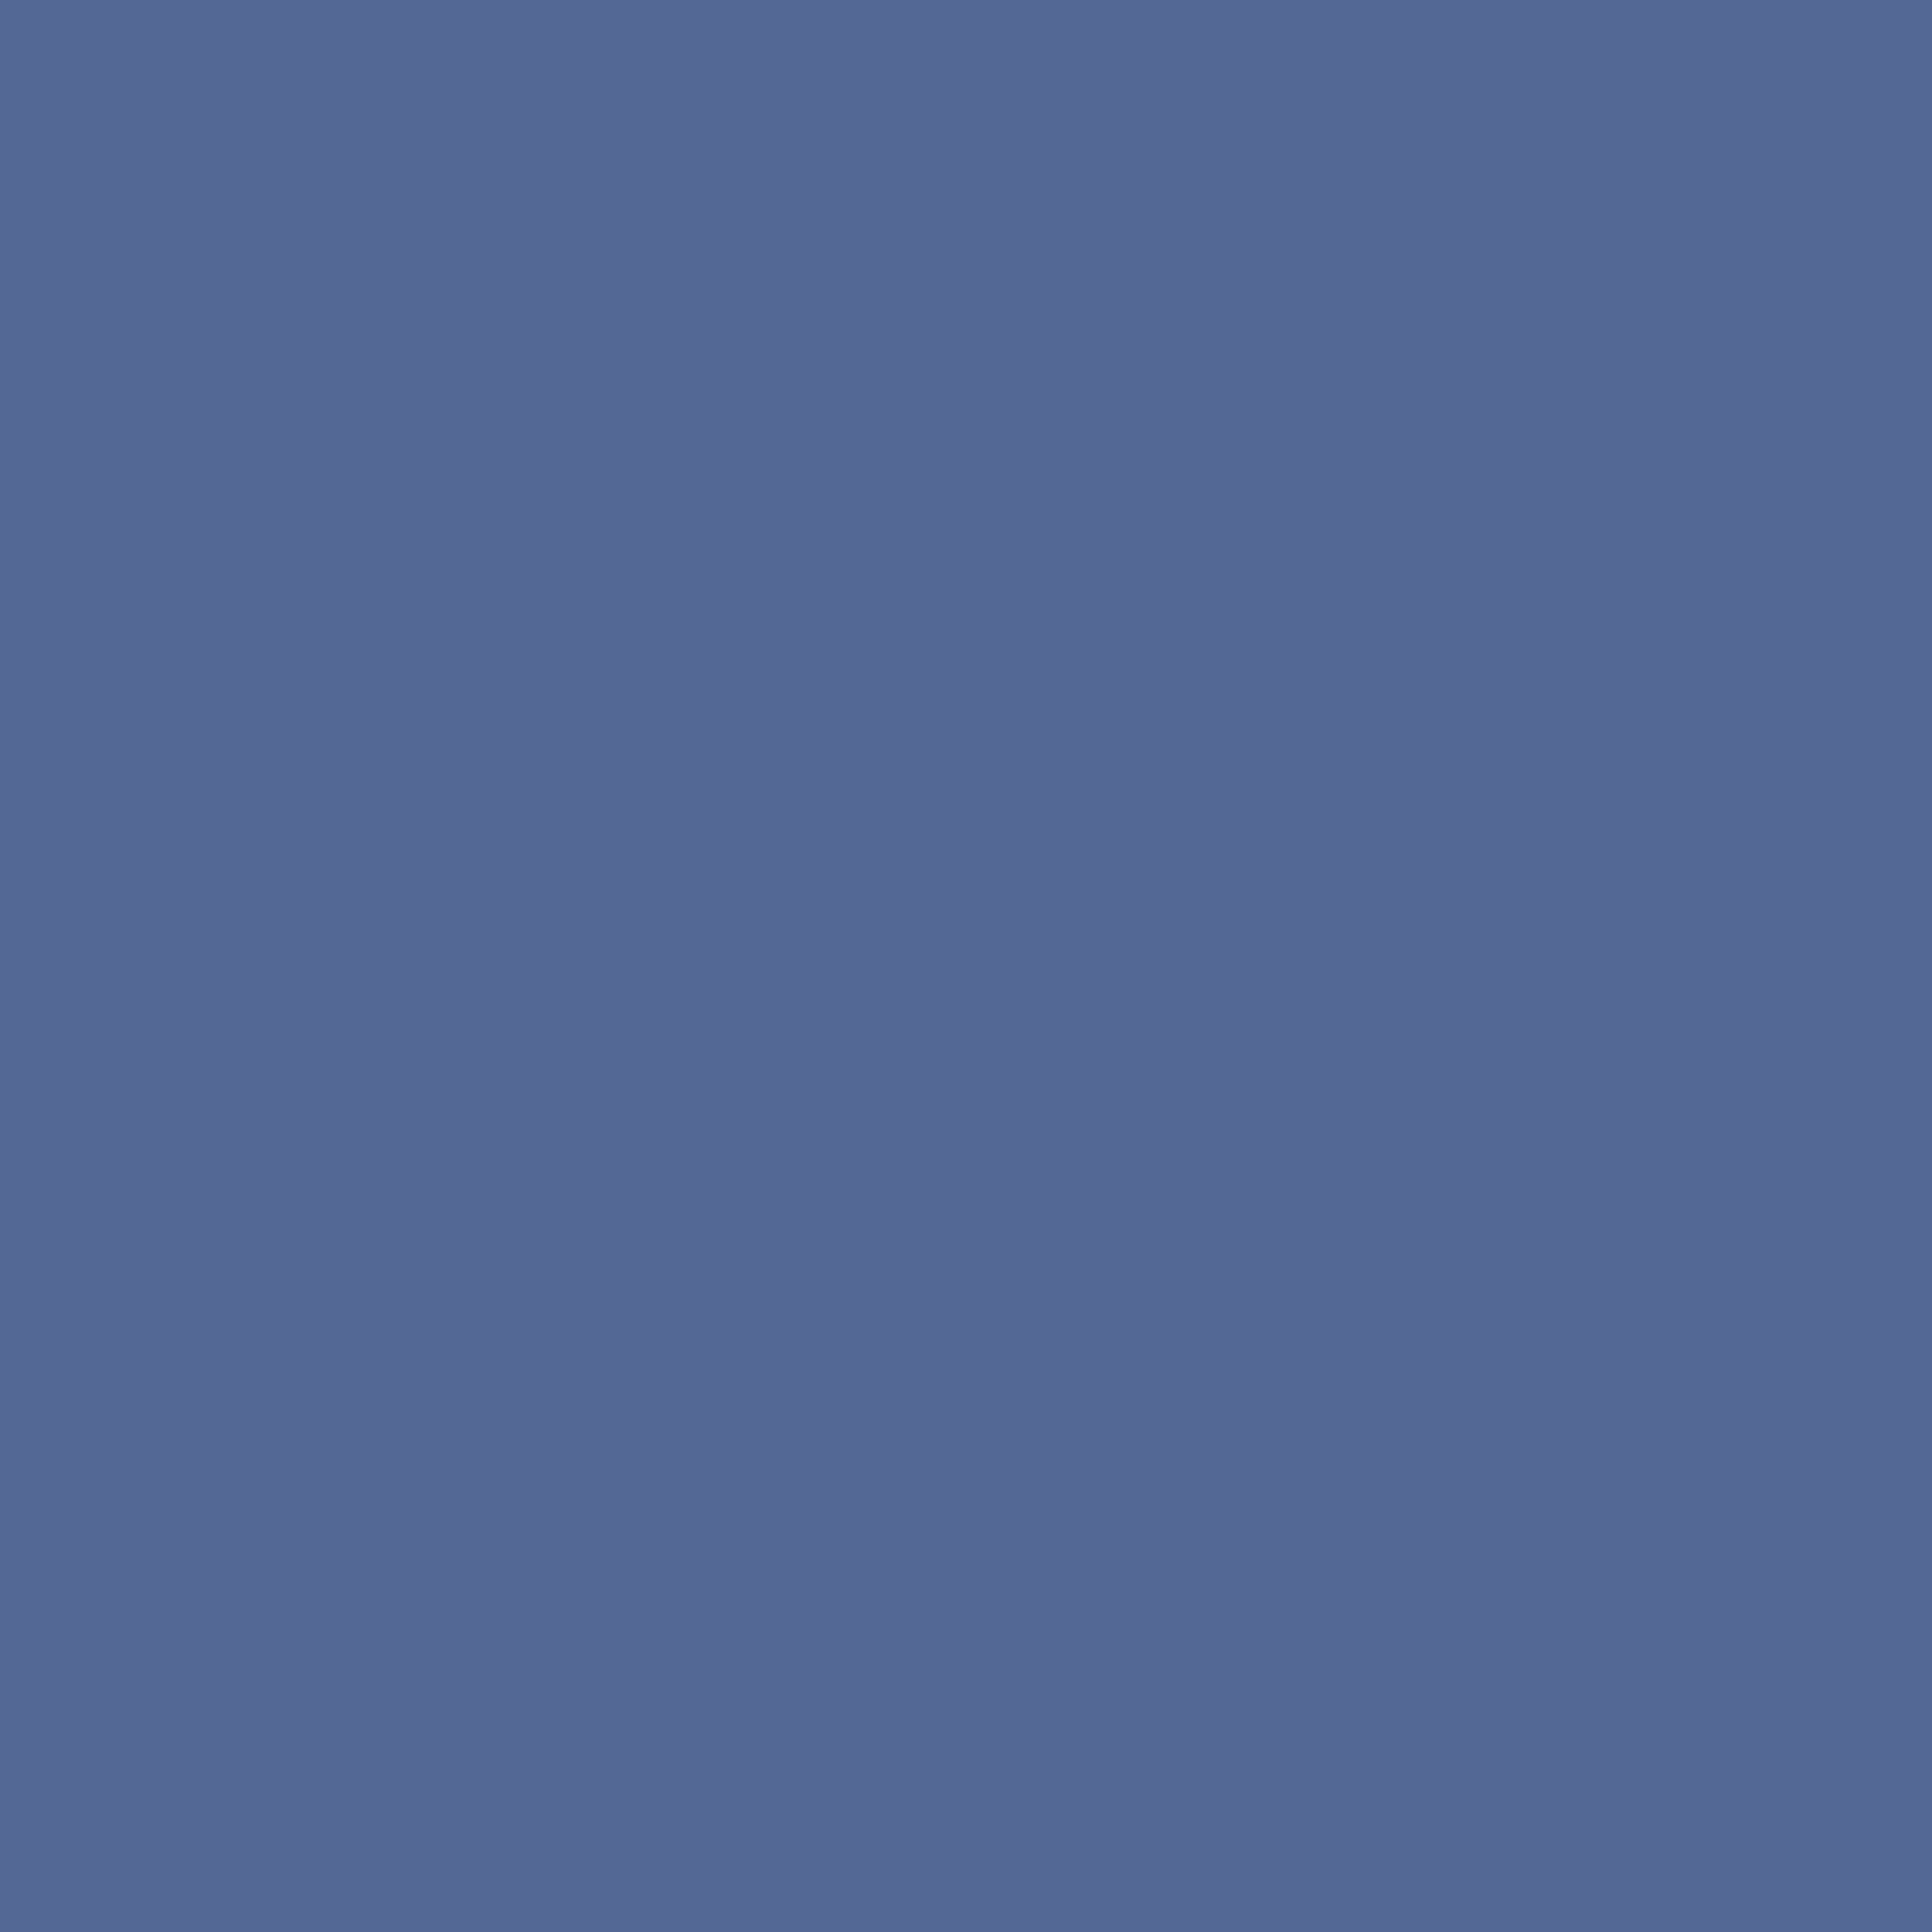 3600x3600 UCLA Blue Solid Color Background